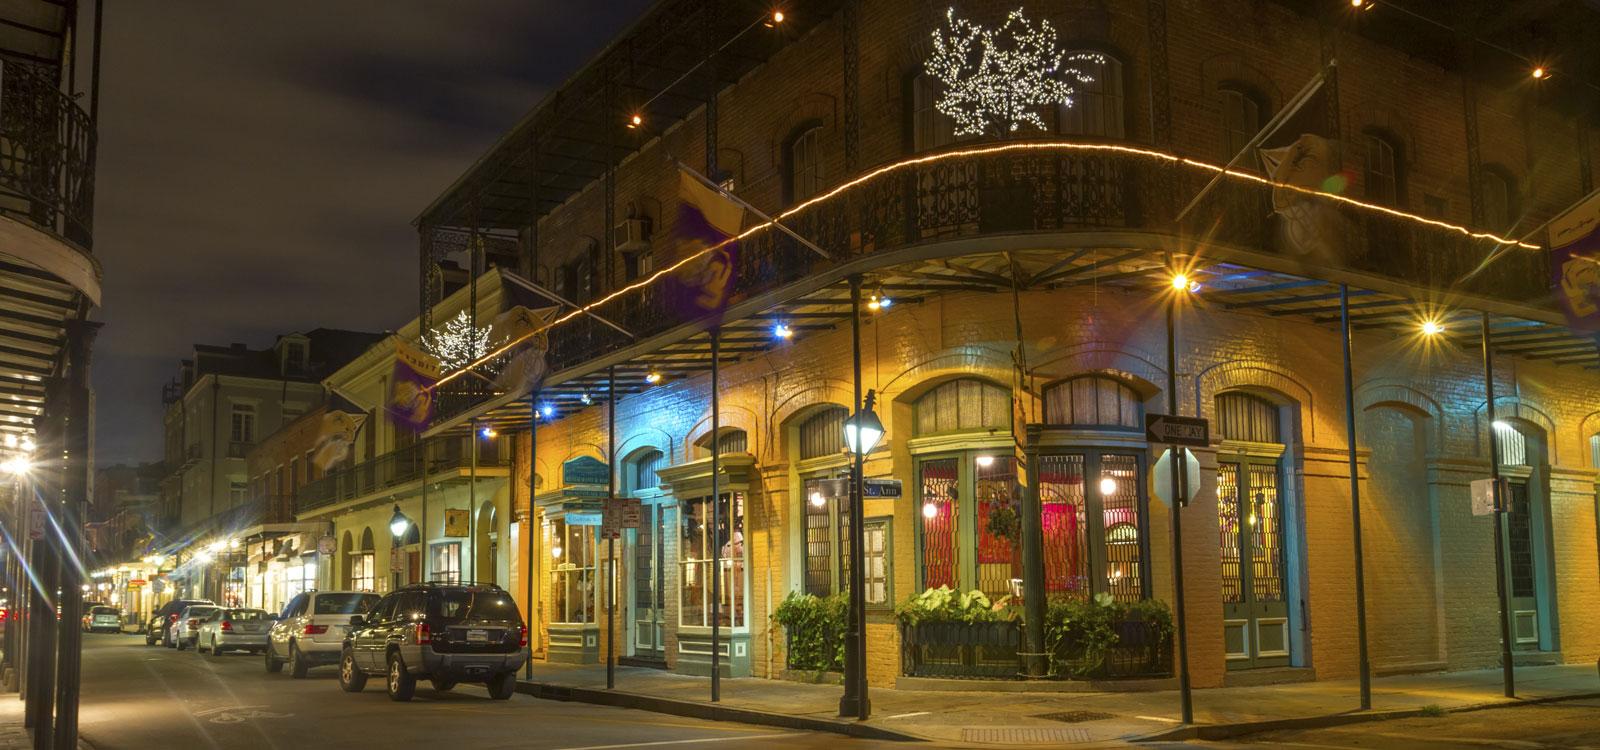 Bourbon Street at New Orleans